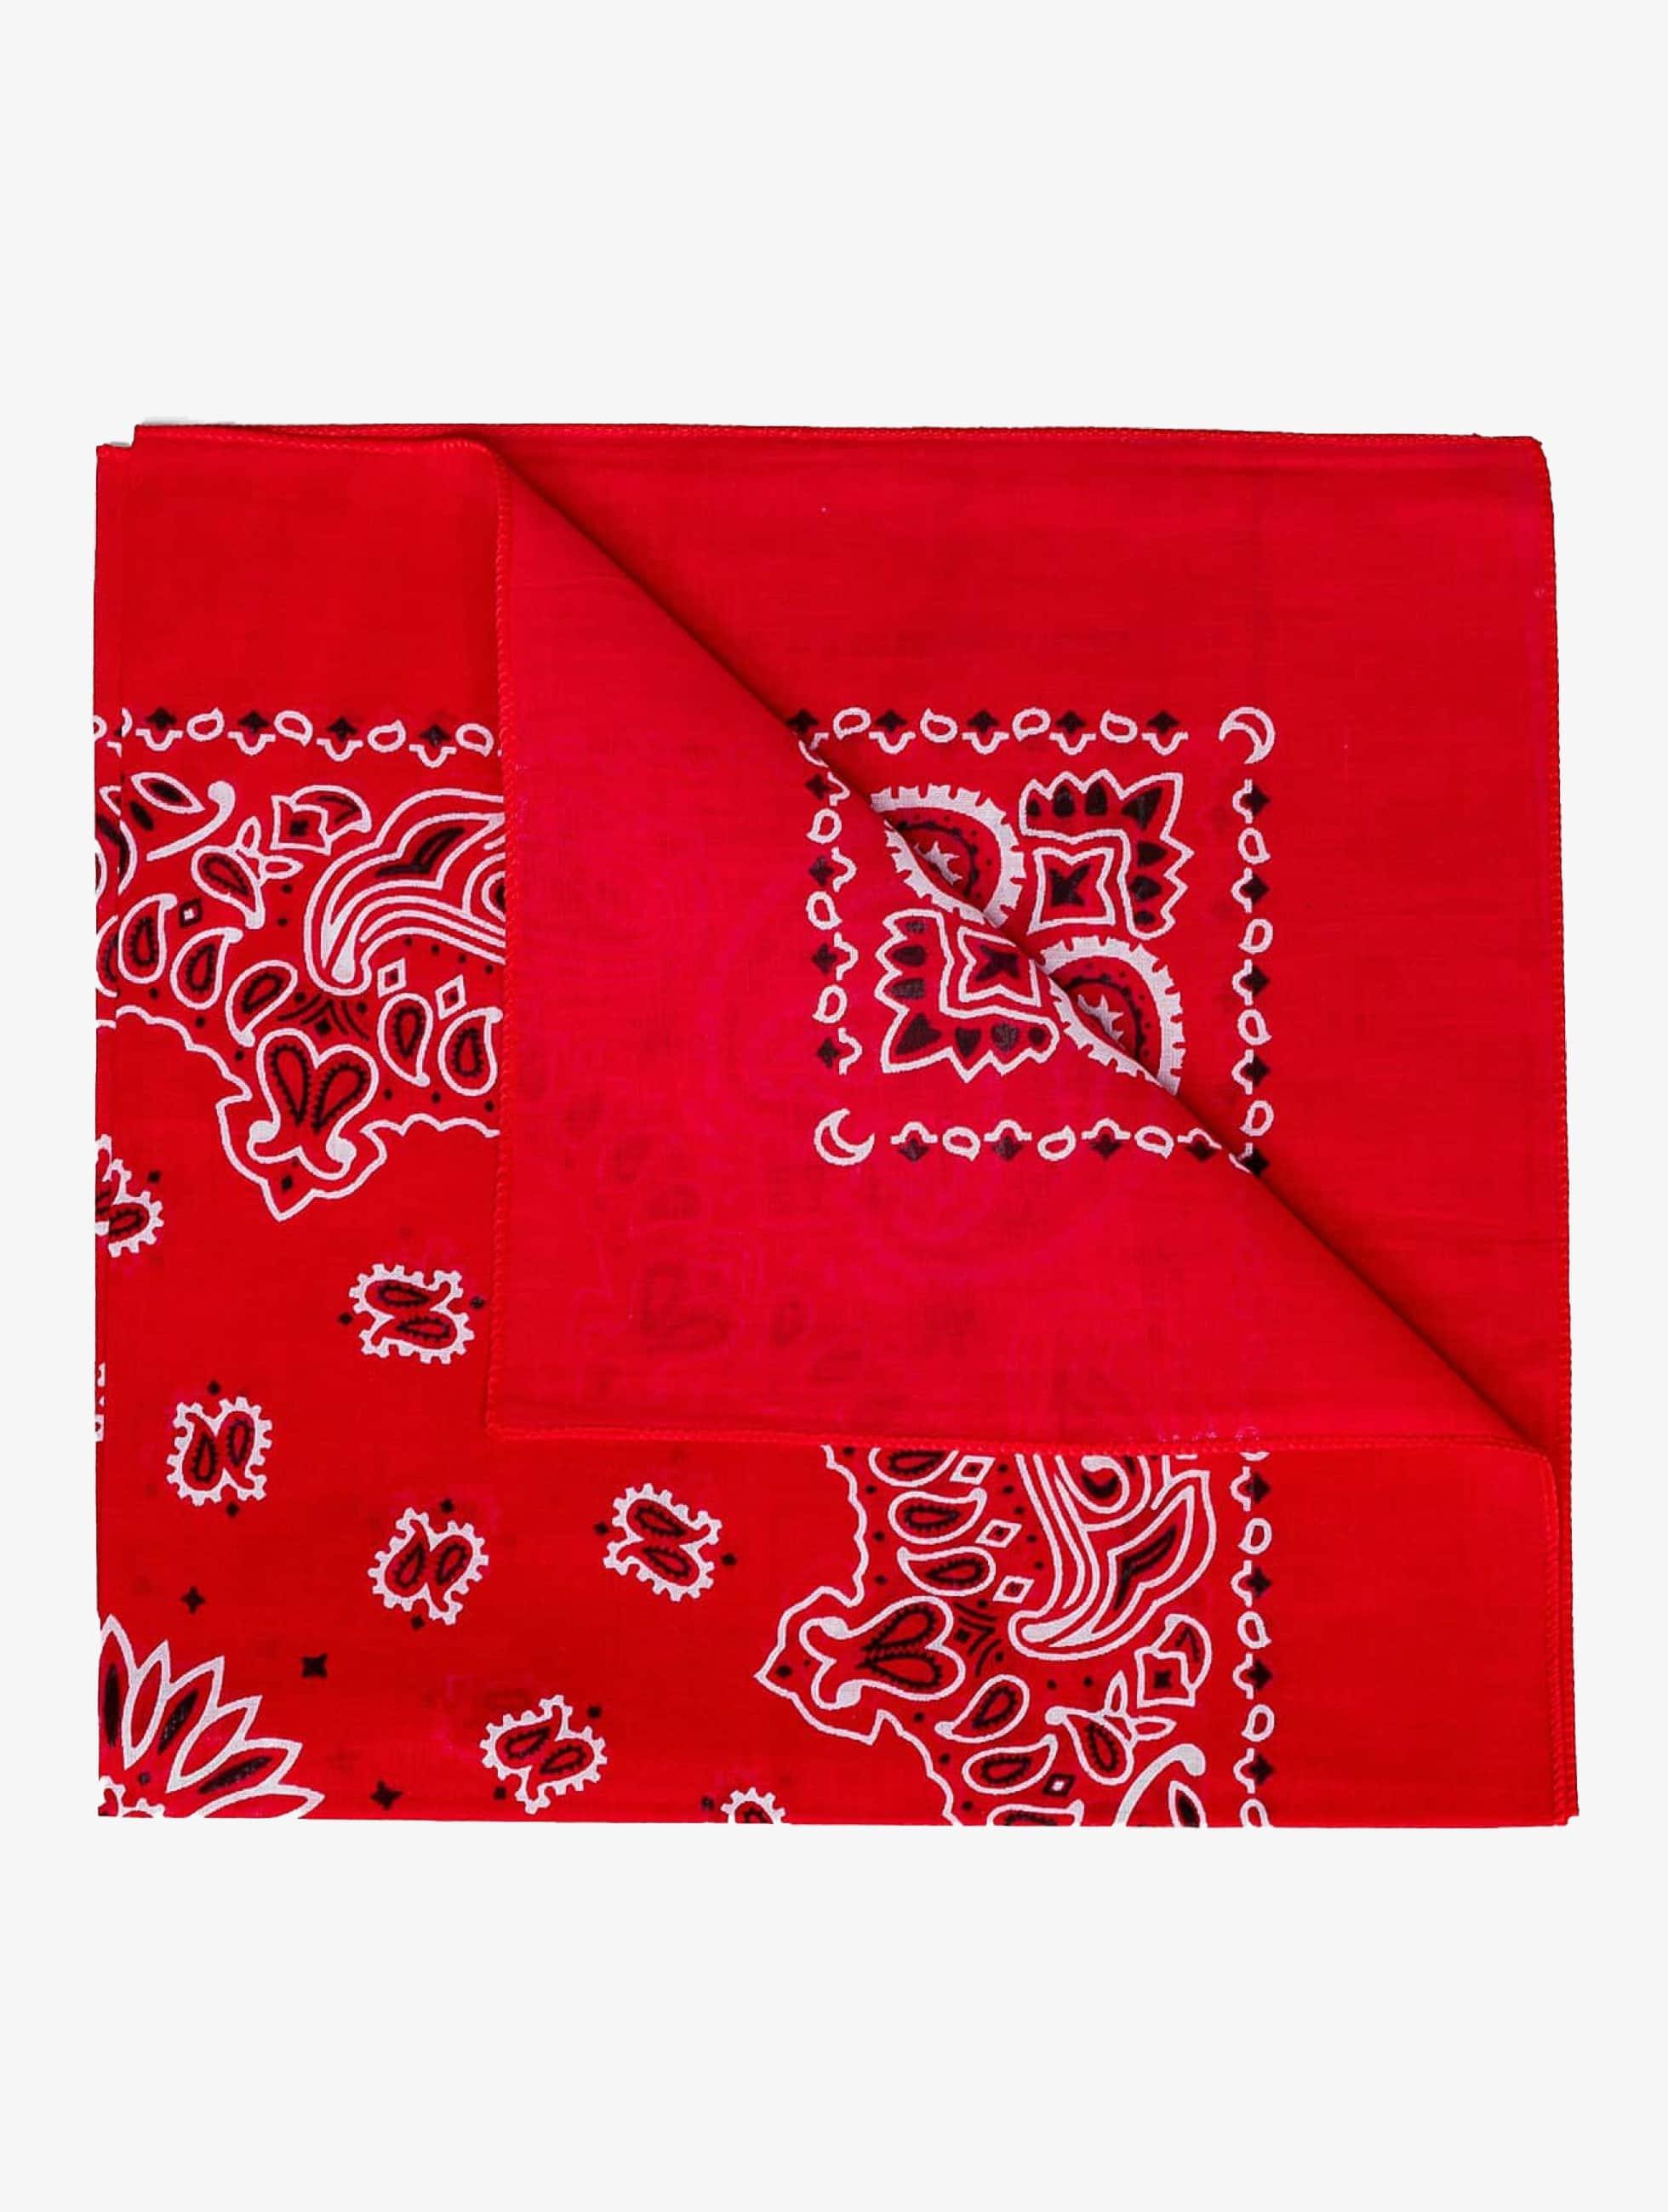 MSTRDS Männer,Frauen Bandana Printed in rot